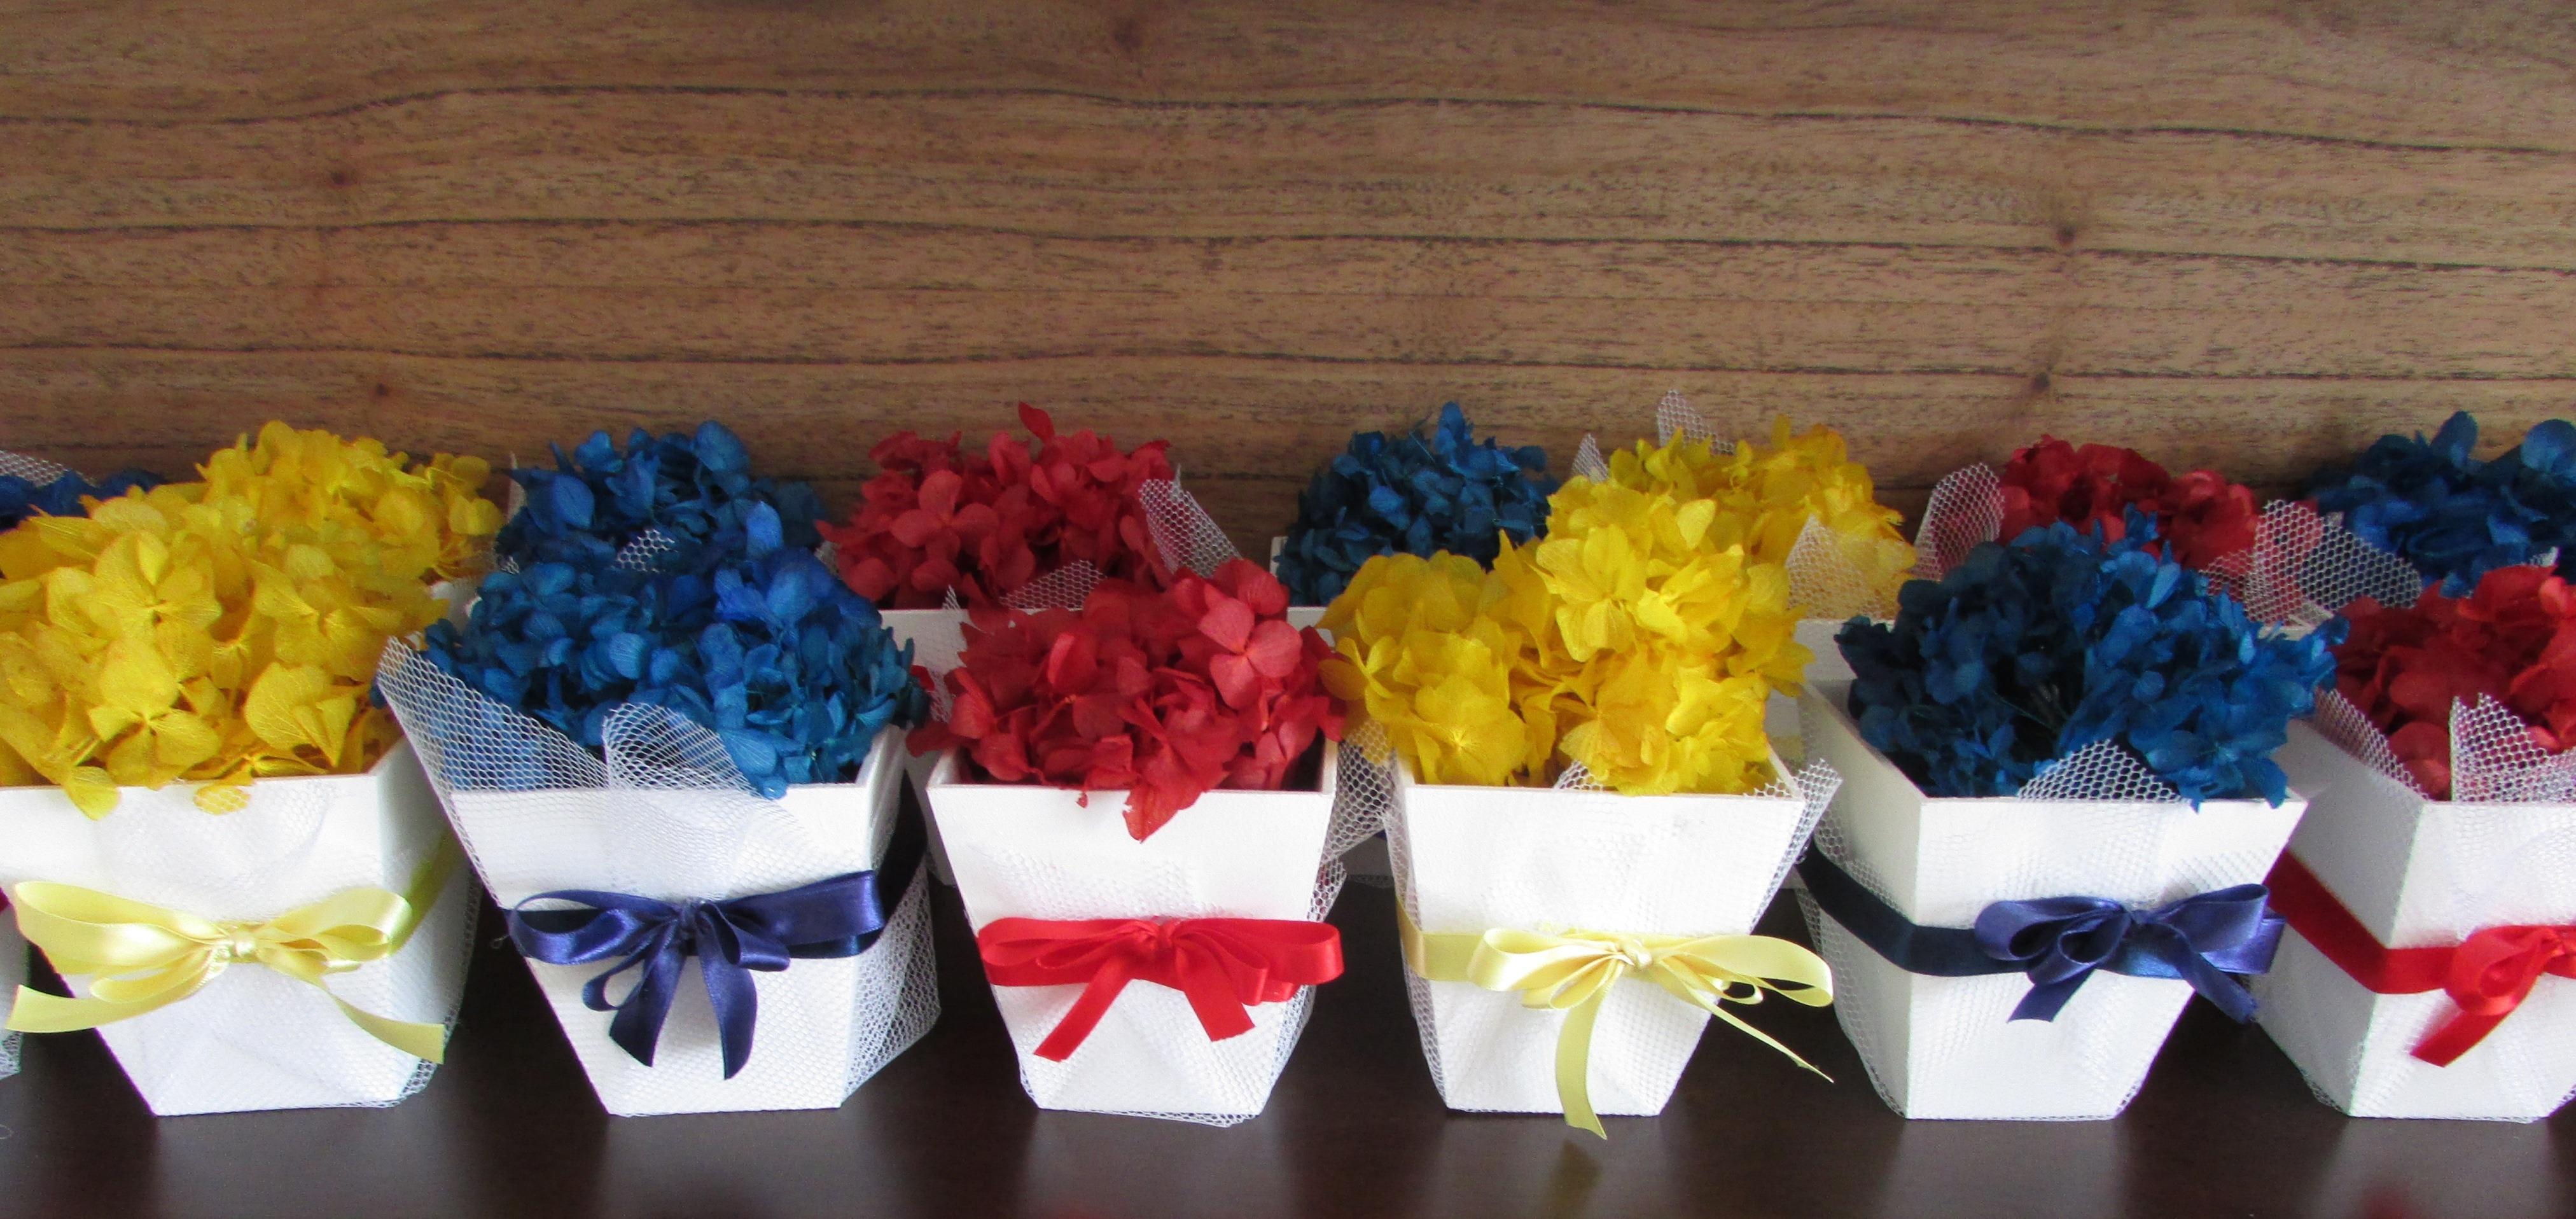 decoracao de festa infantil azul e amarelo:arranjo amarelo hortencia arranjo amarelo hortencia arranjo amarelo